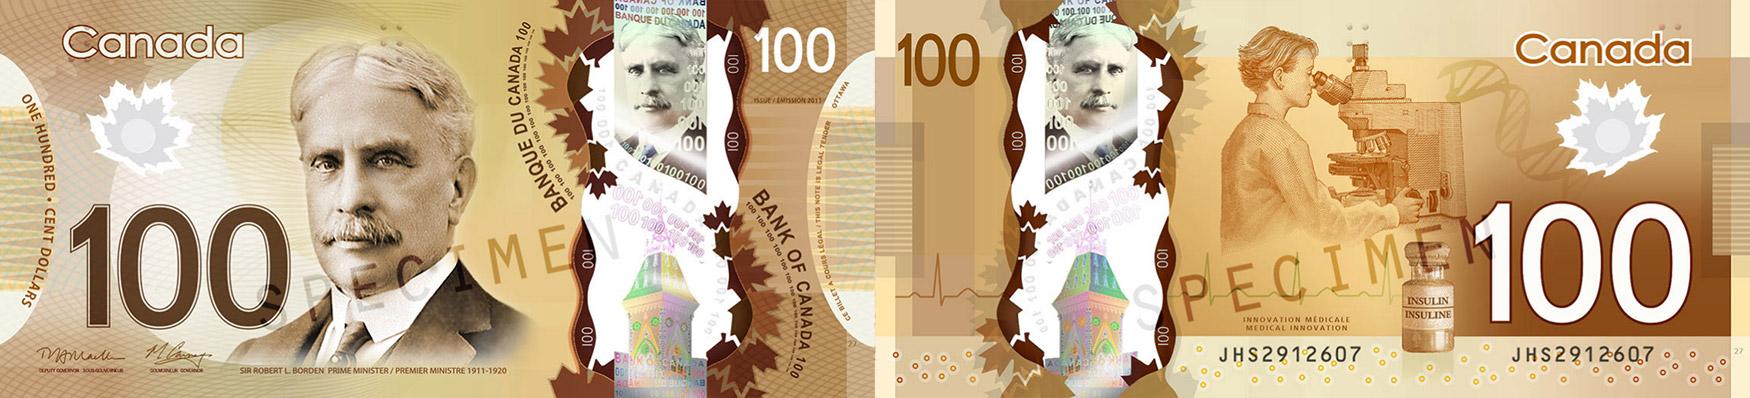 100 dollars 2011